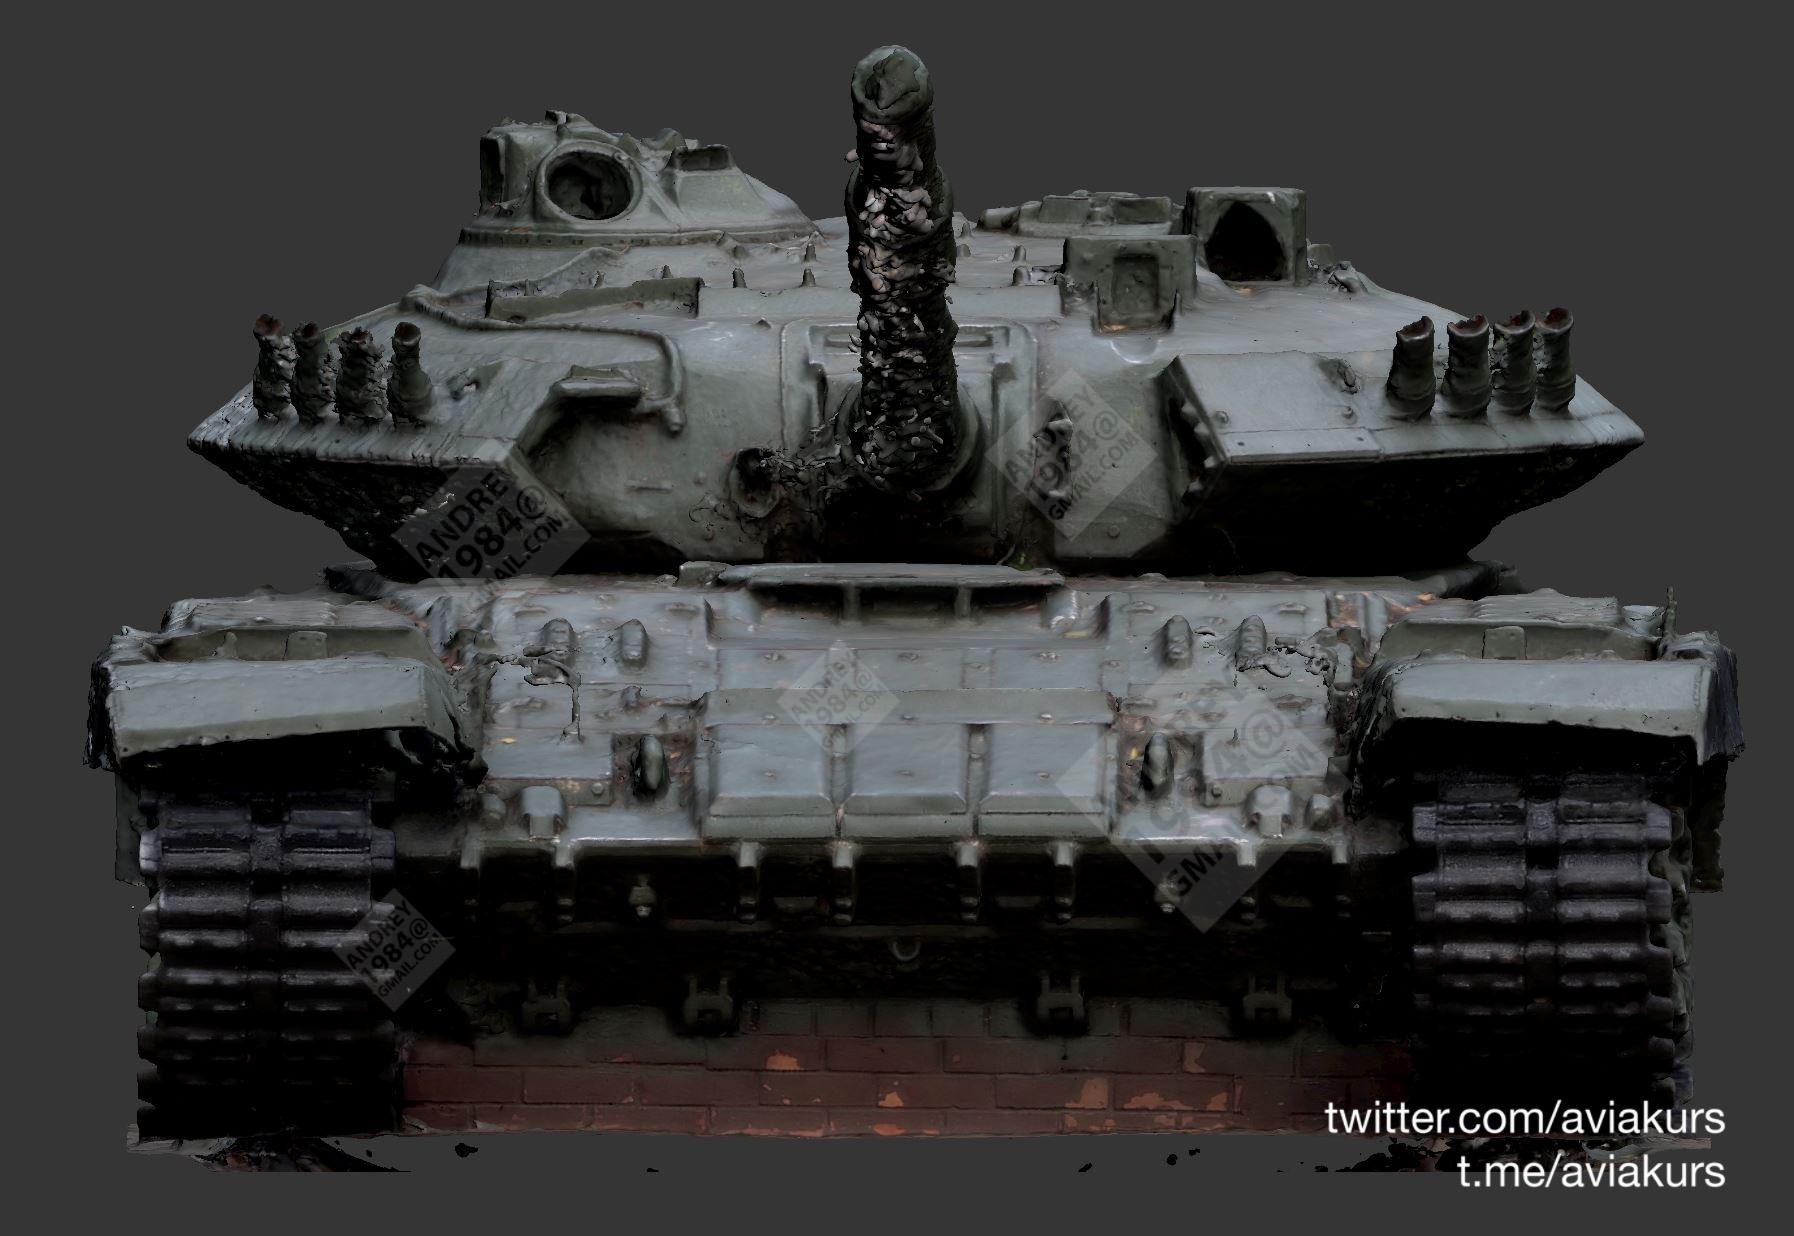 Emz-Bth-XXUAEh-M4-G-format-jpg-name-4096x4096